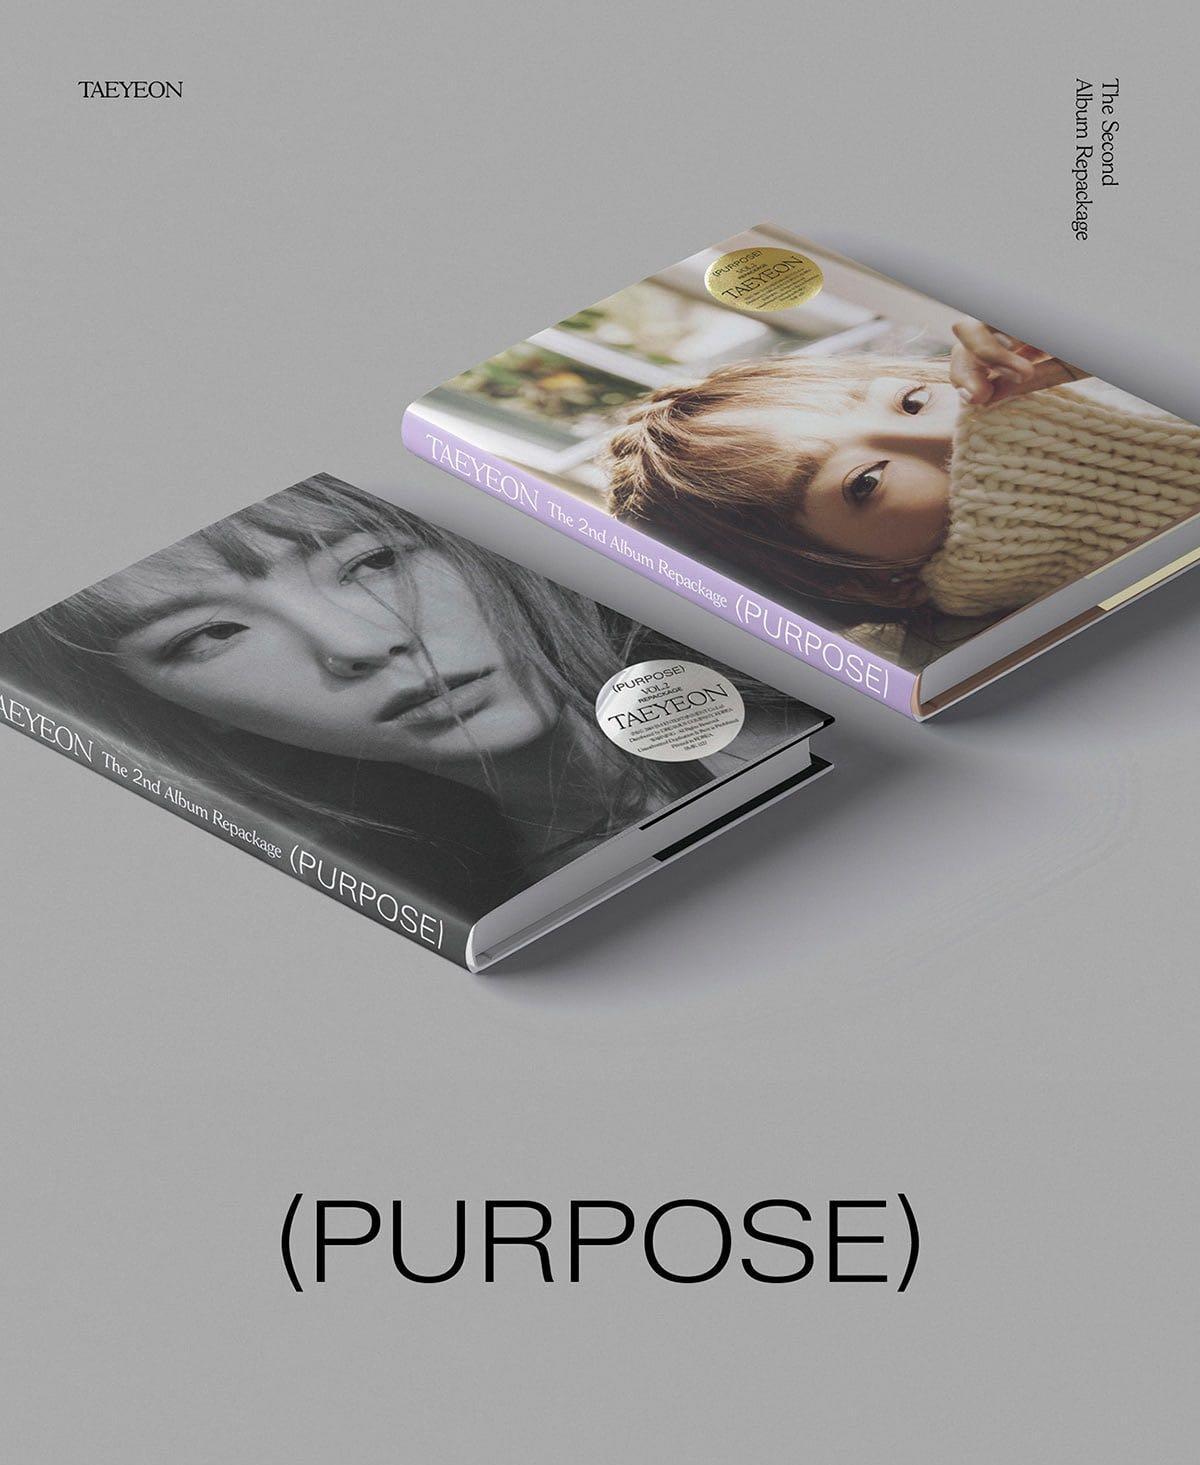 [Pre-Order] TAEYEON - Album Vol.2 Repackage (Purpose)